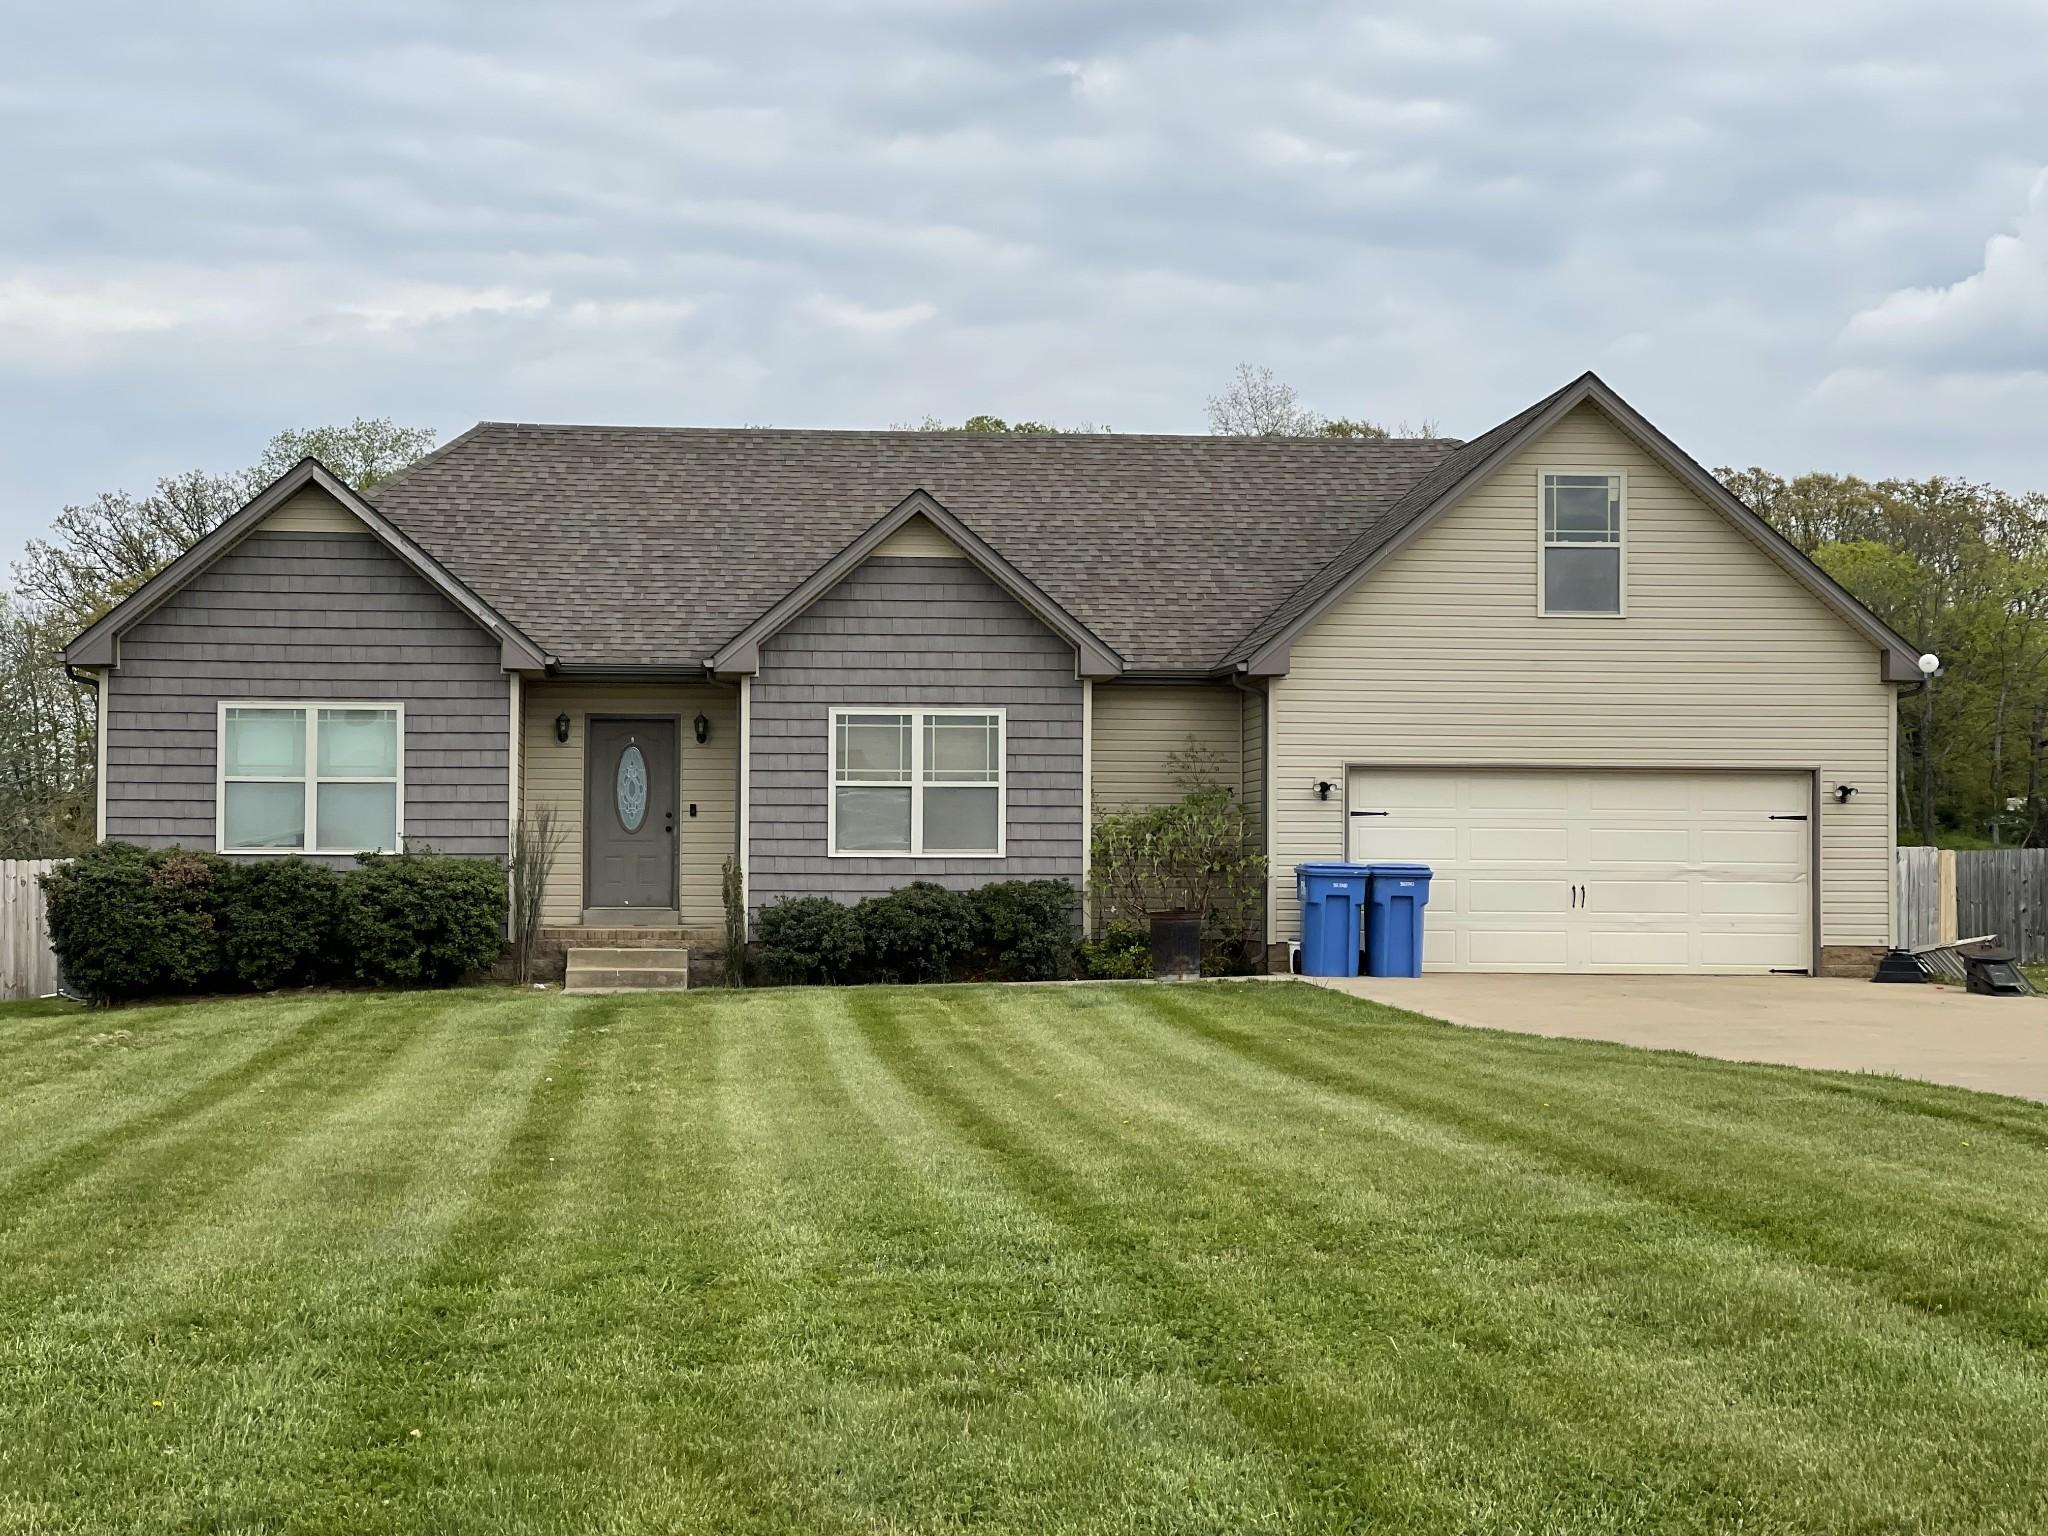 5096 John Rivers Rd Property Photo - Pembroke, KY real estate listing